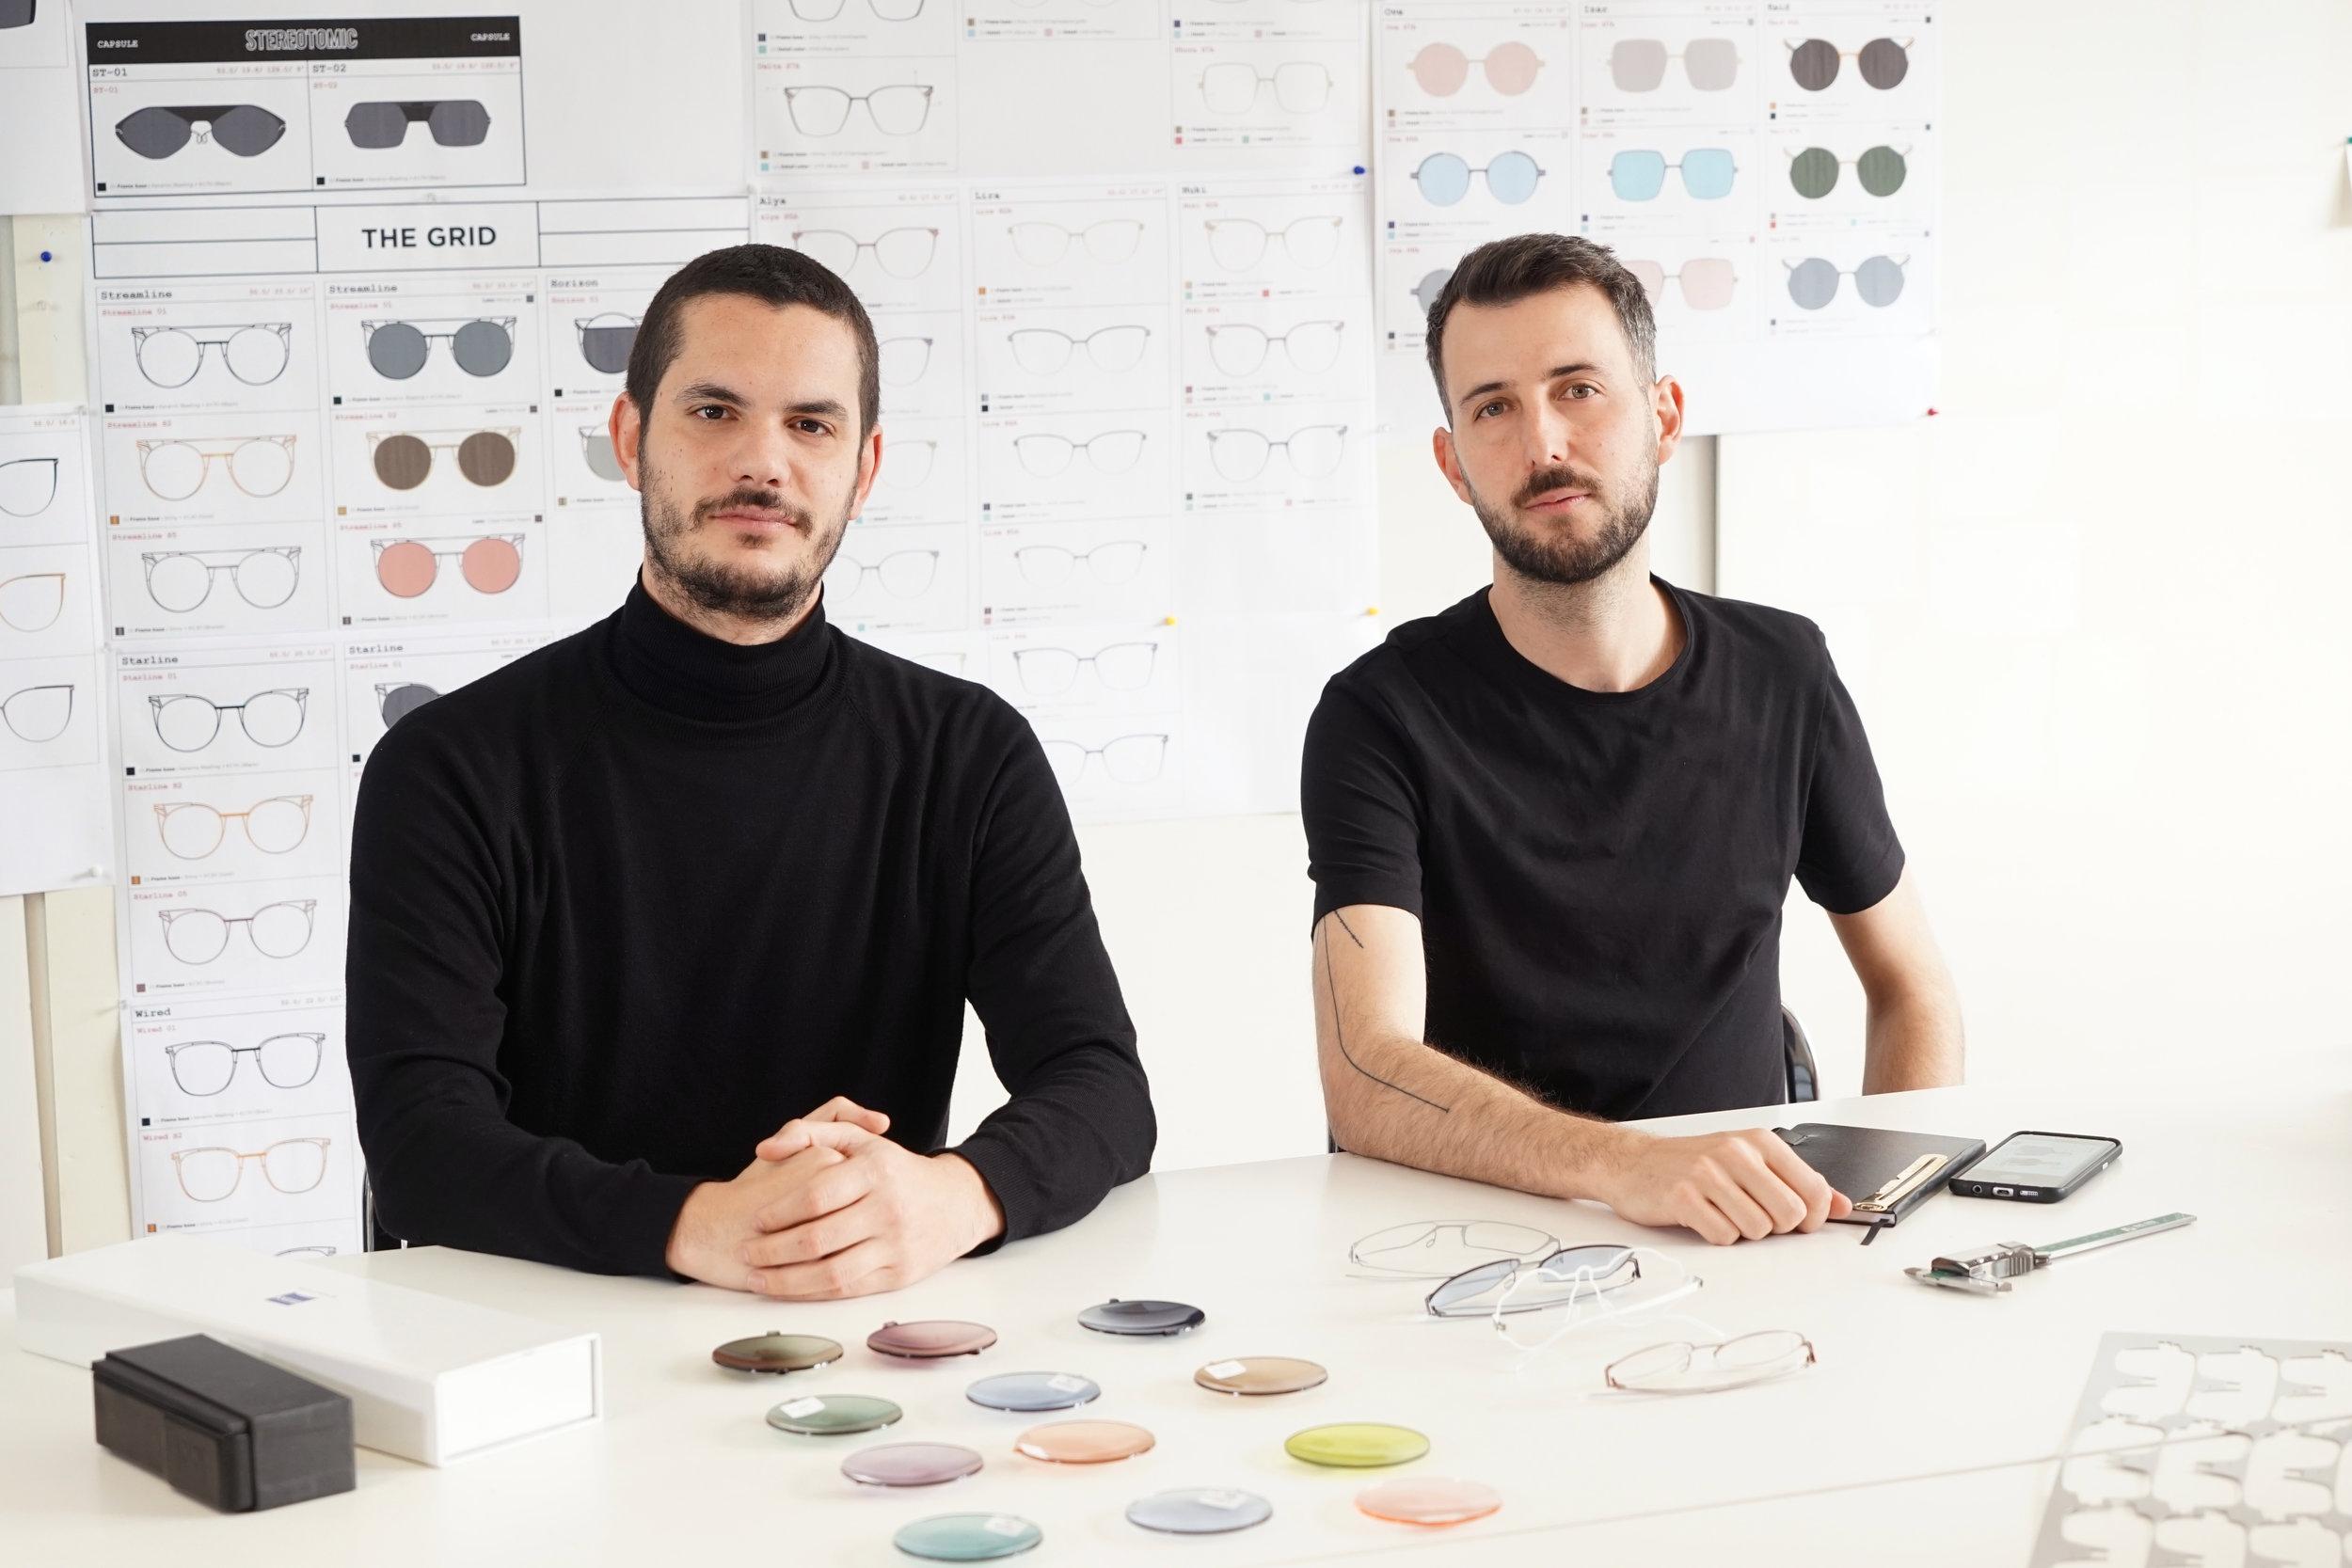 Alex Gomez Carrasco y Rubén Hidalgo Peiro ( lool eyewear )